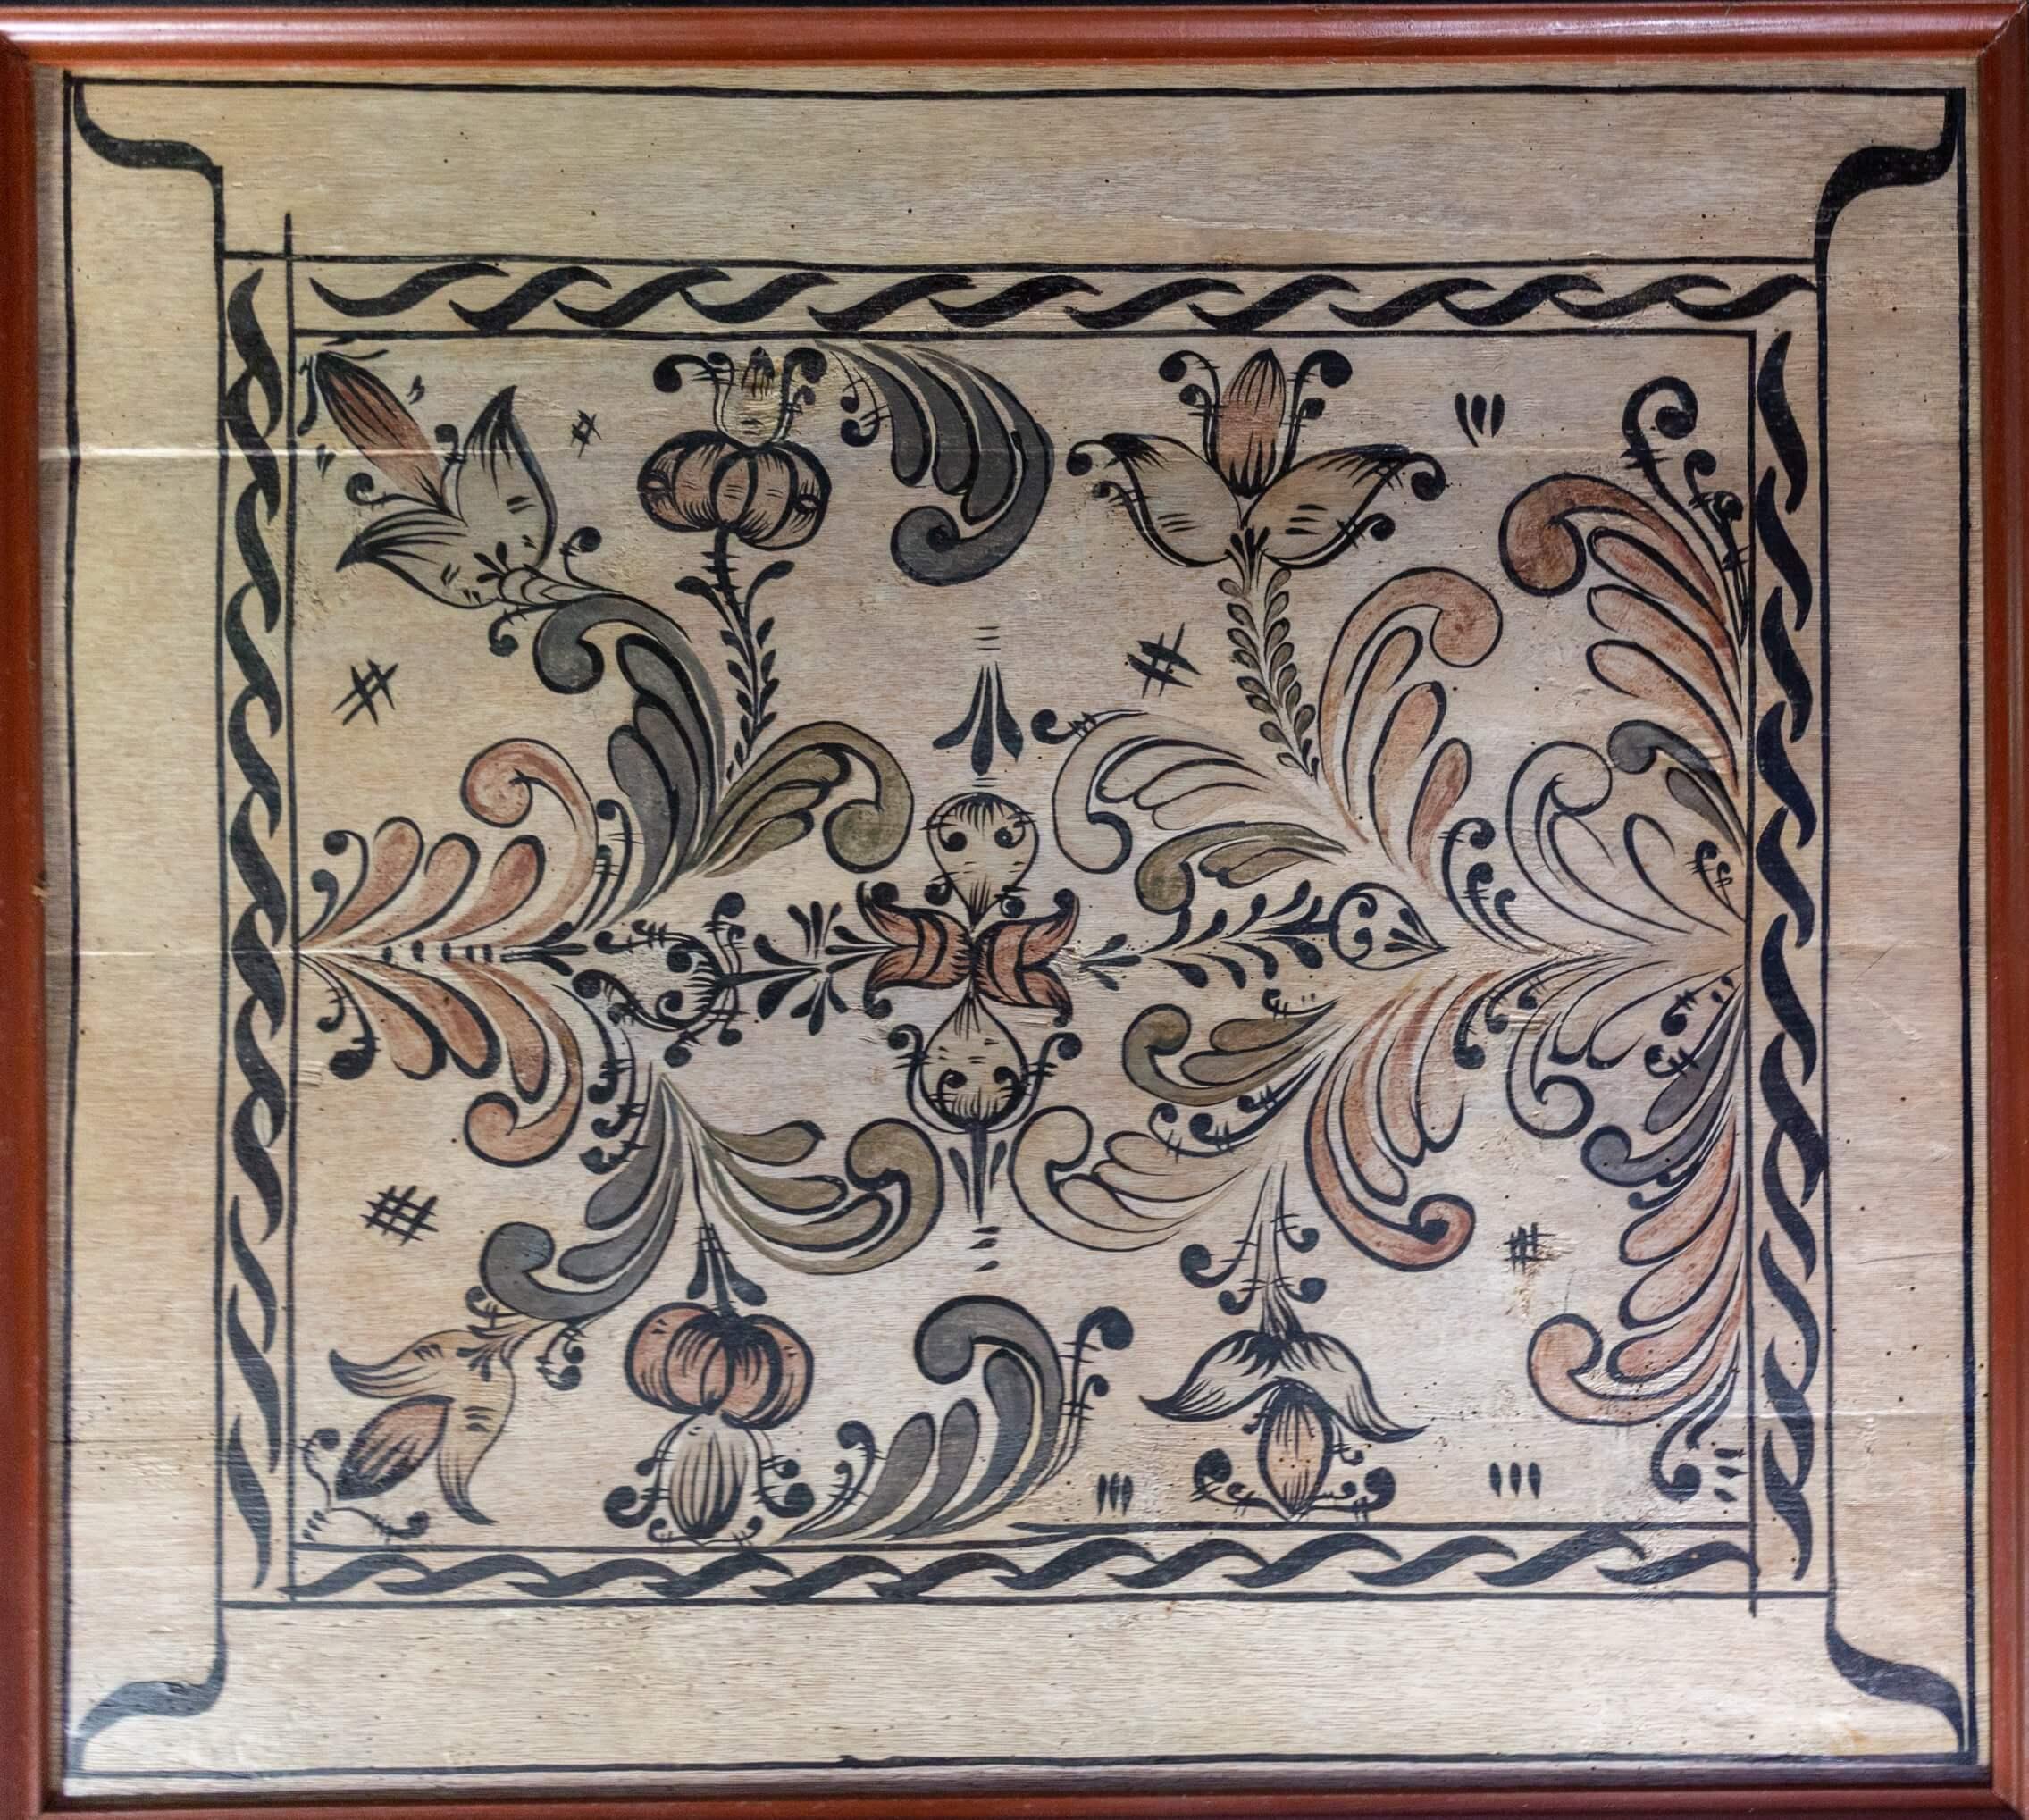 Decken-Holztafel in Tákos